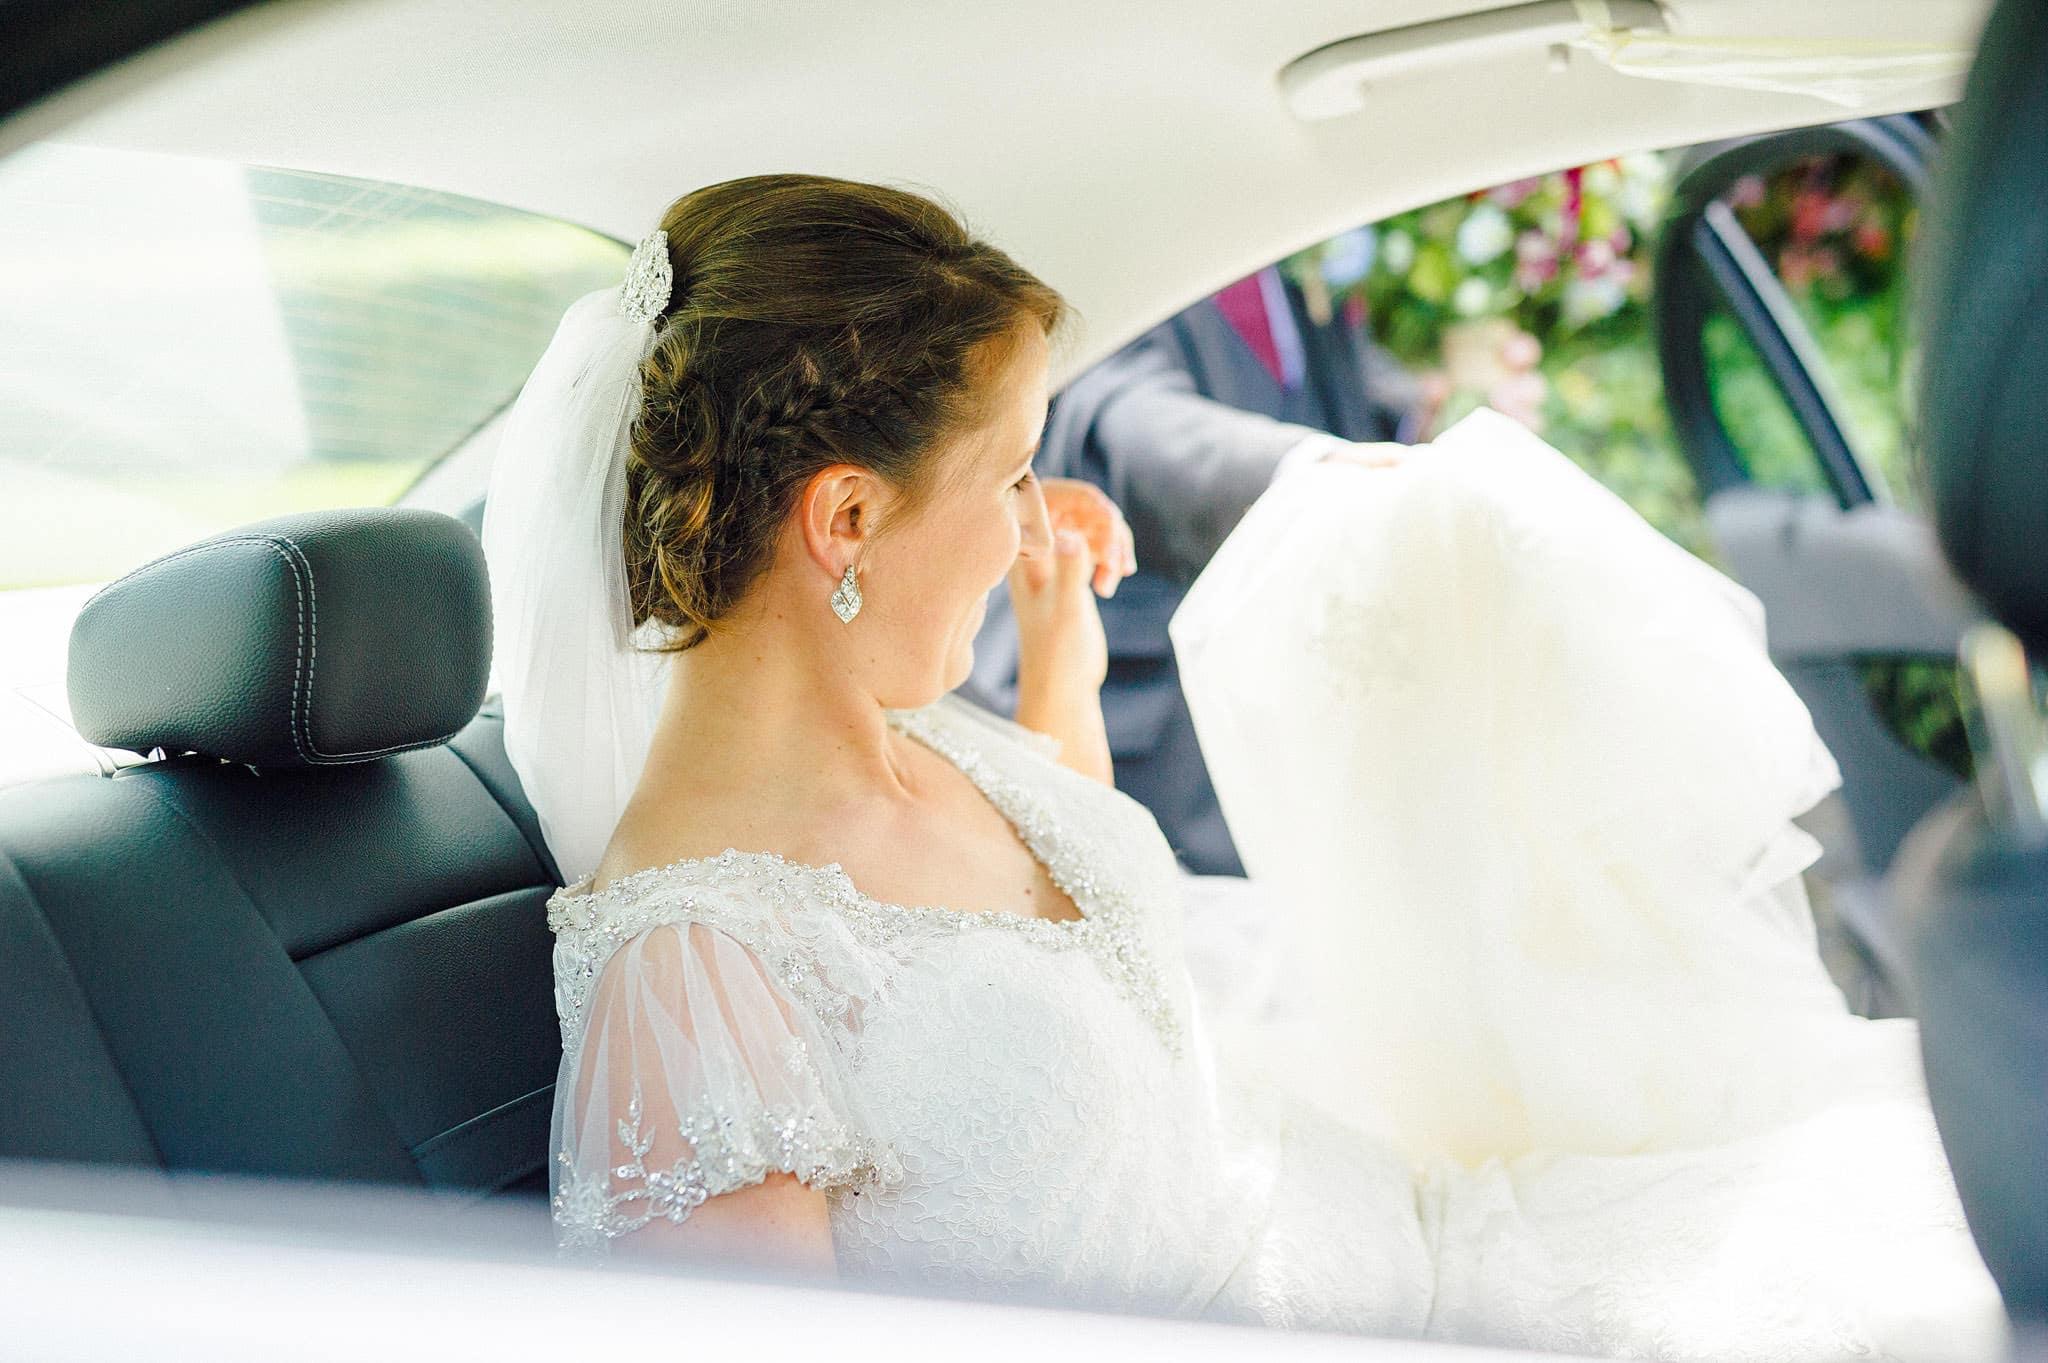 wedding-photographer-aberystwyth-wales (28)